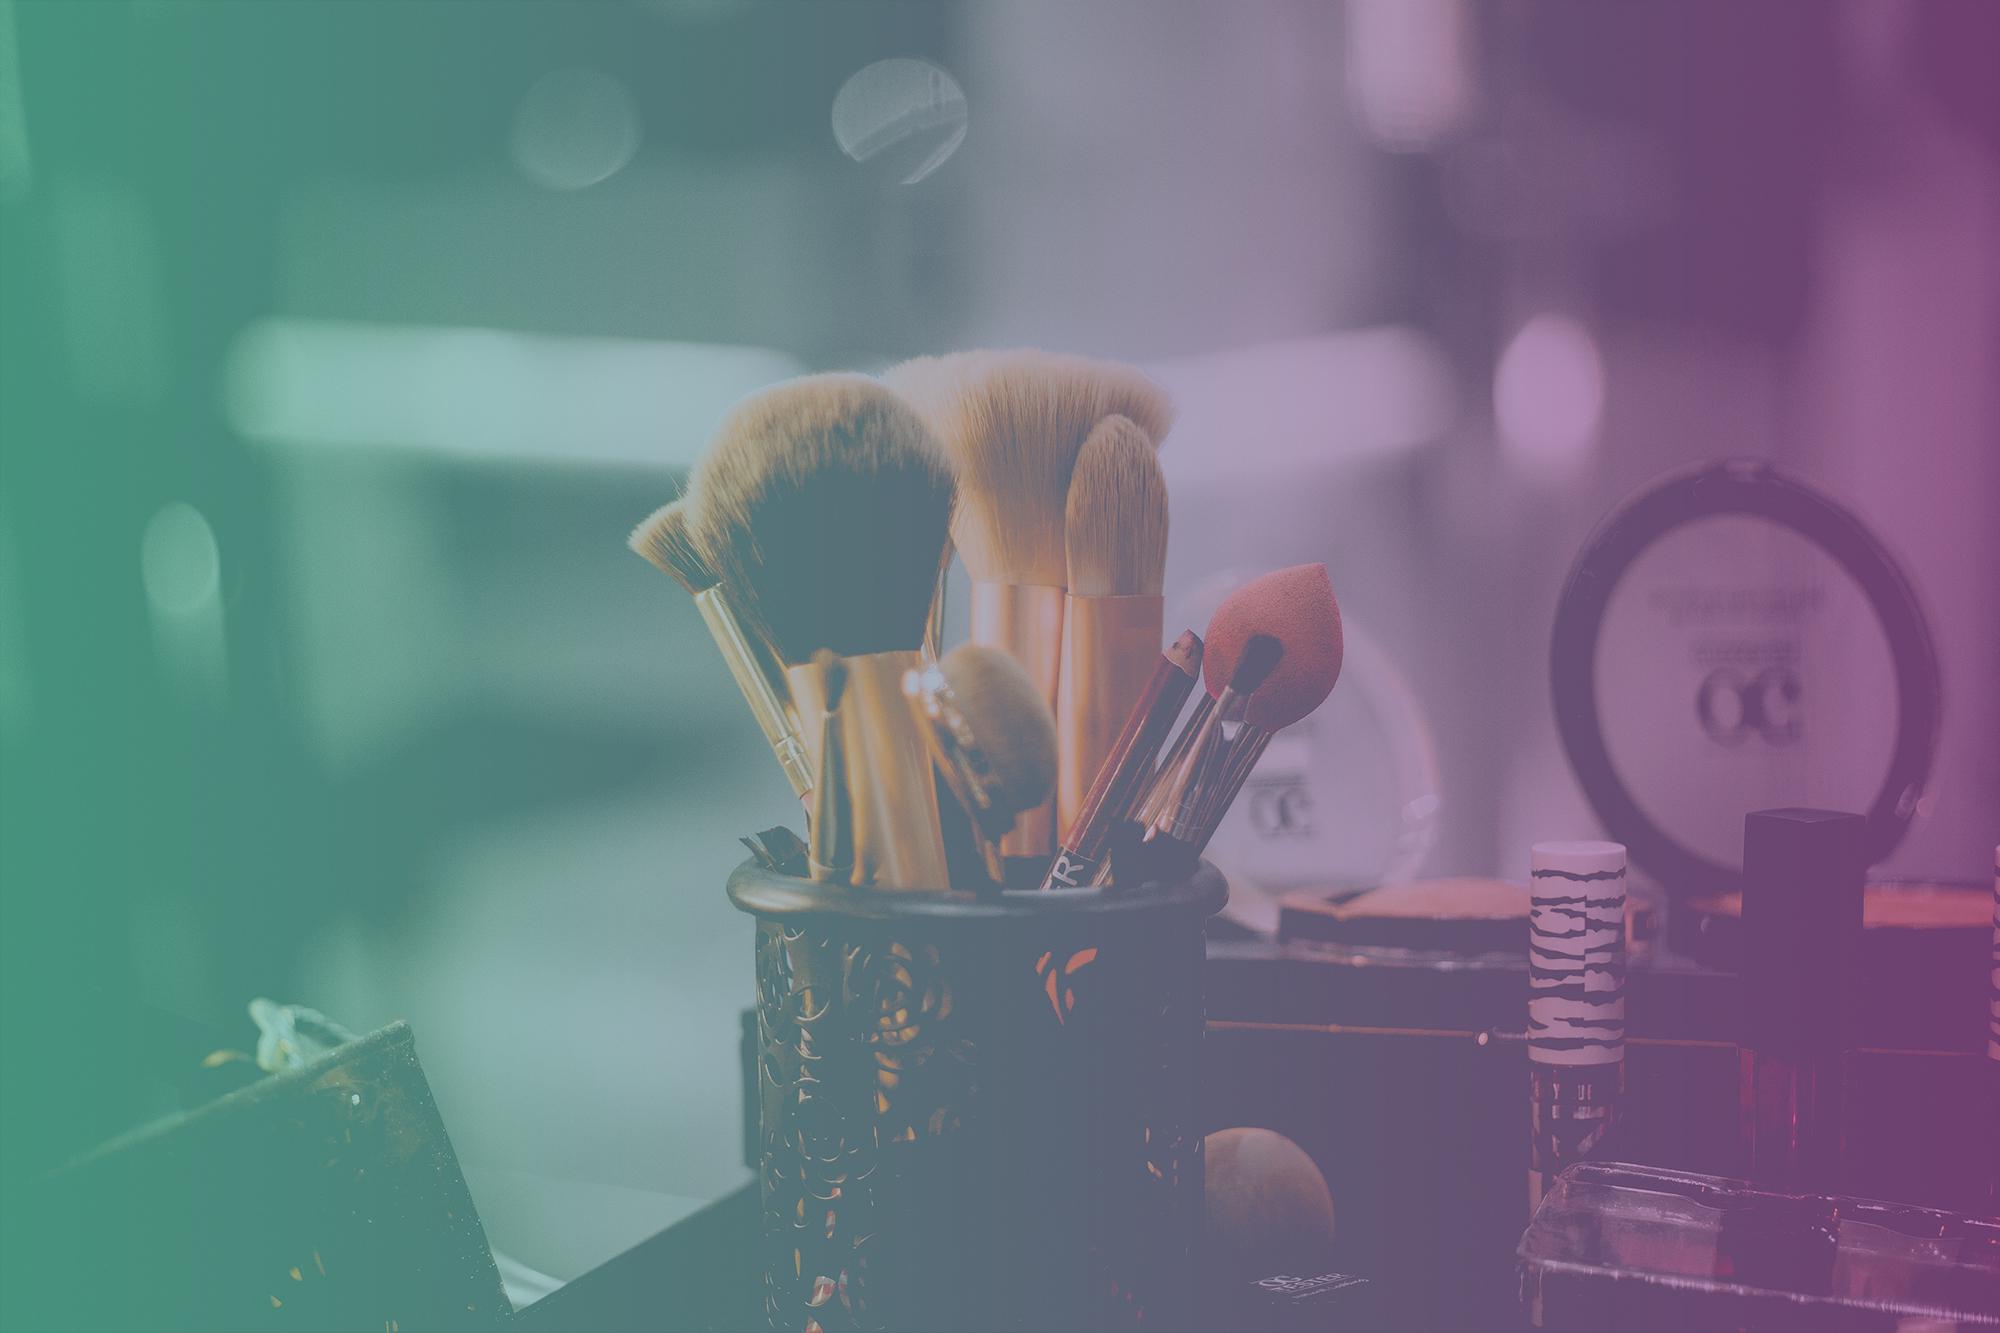 female beauty influencers